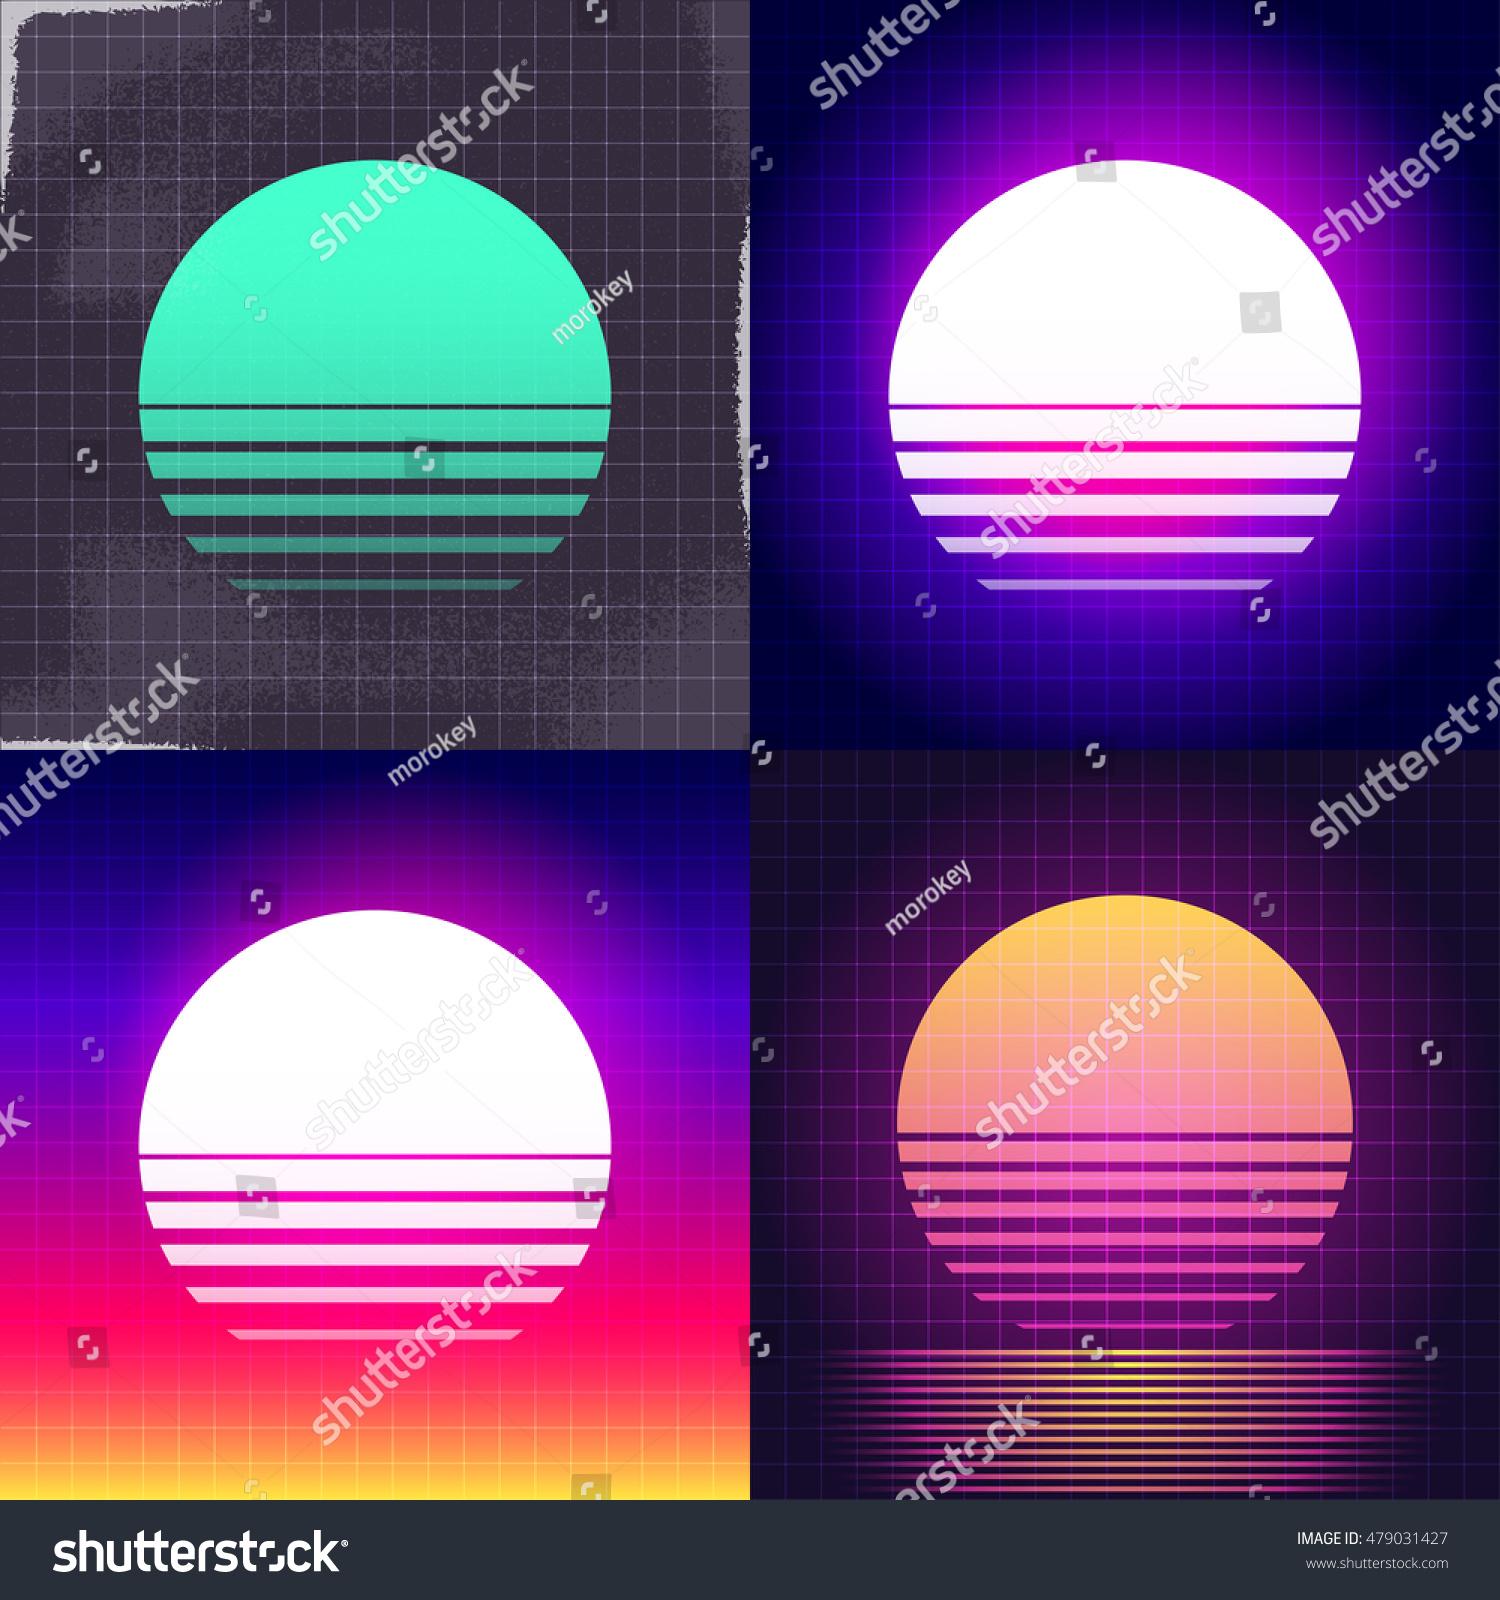 Digitalrevolution Blog Retro Sci Fi: 80s Retro Scifi Sunset Background Vhs Stock Vector